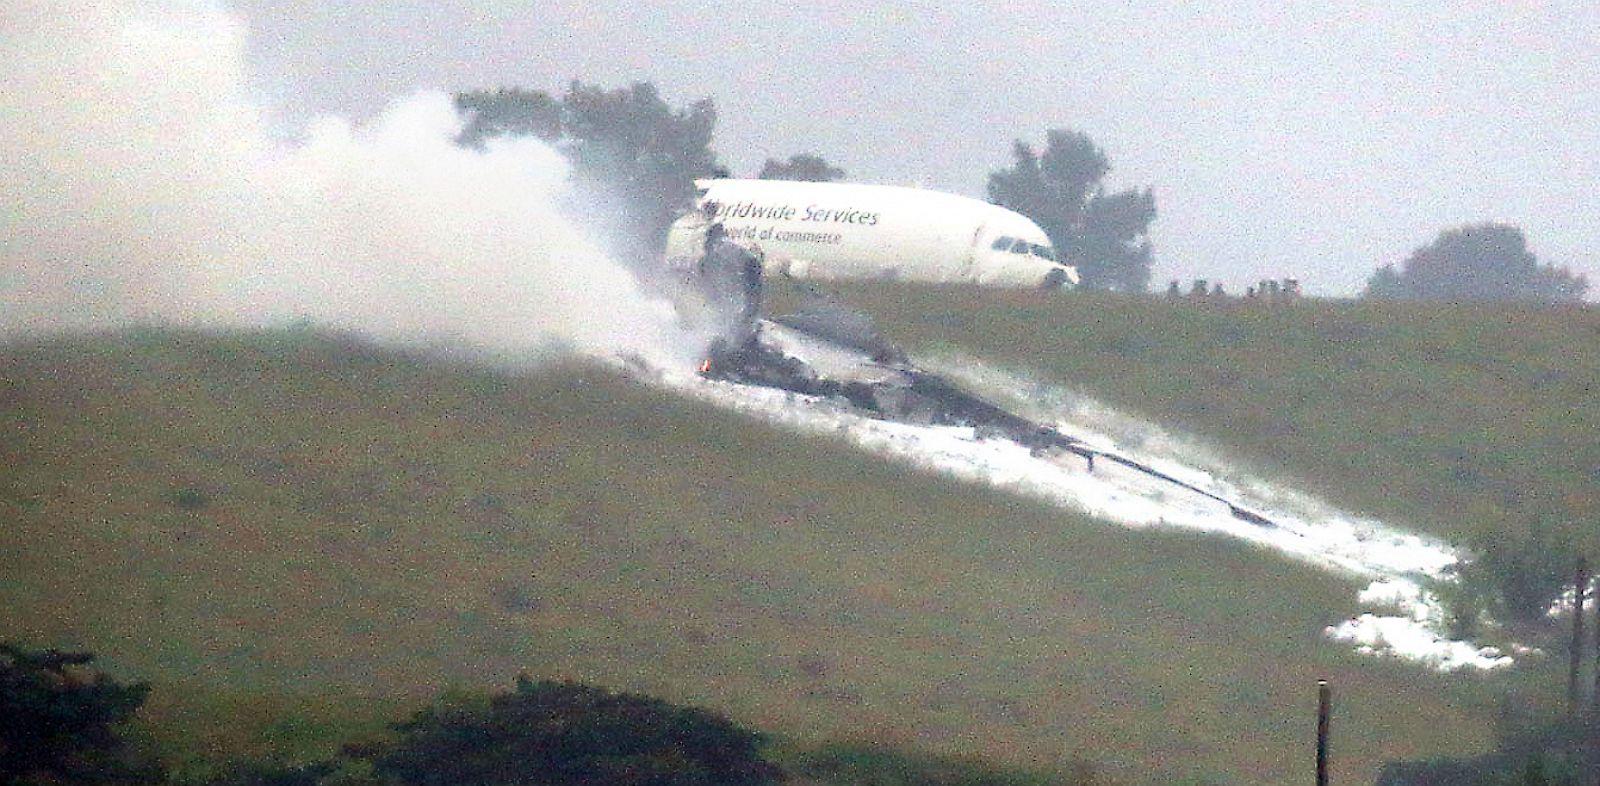 PHOTO: UPS cargo plane crash